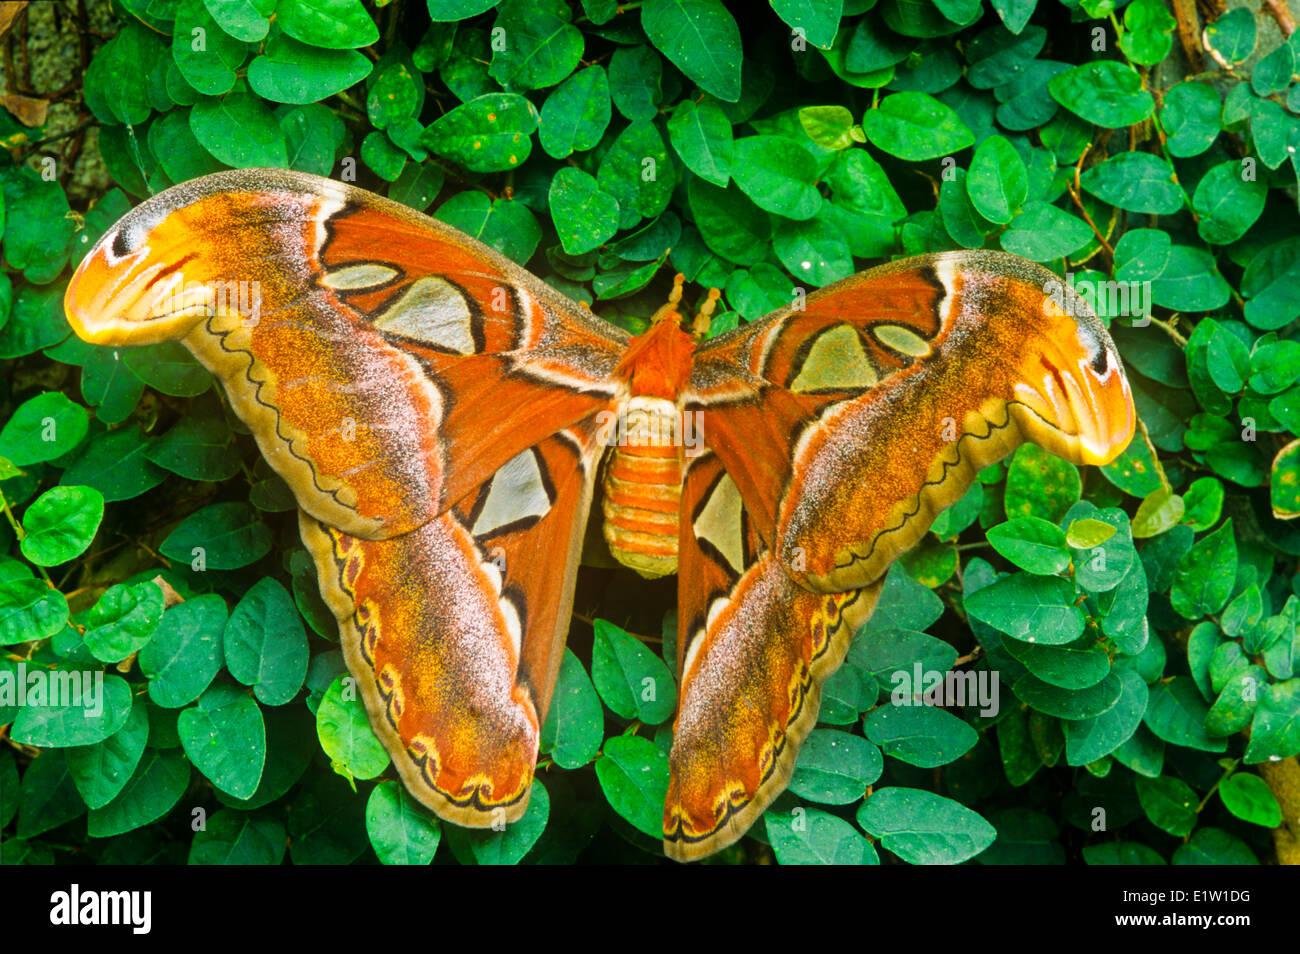 Adult Atlas Moth, (Attacus atlas), dorsal view - Stock Image